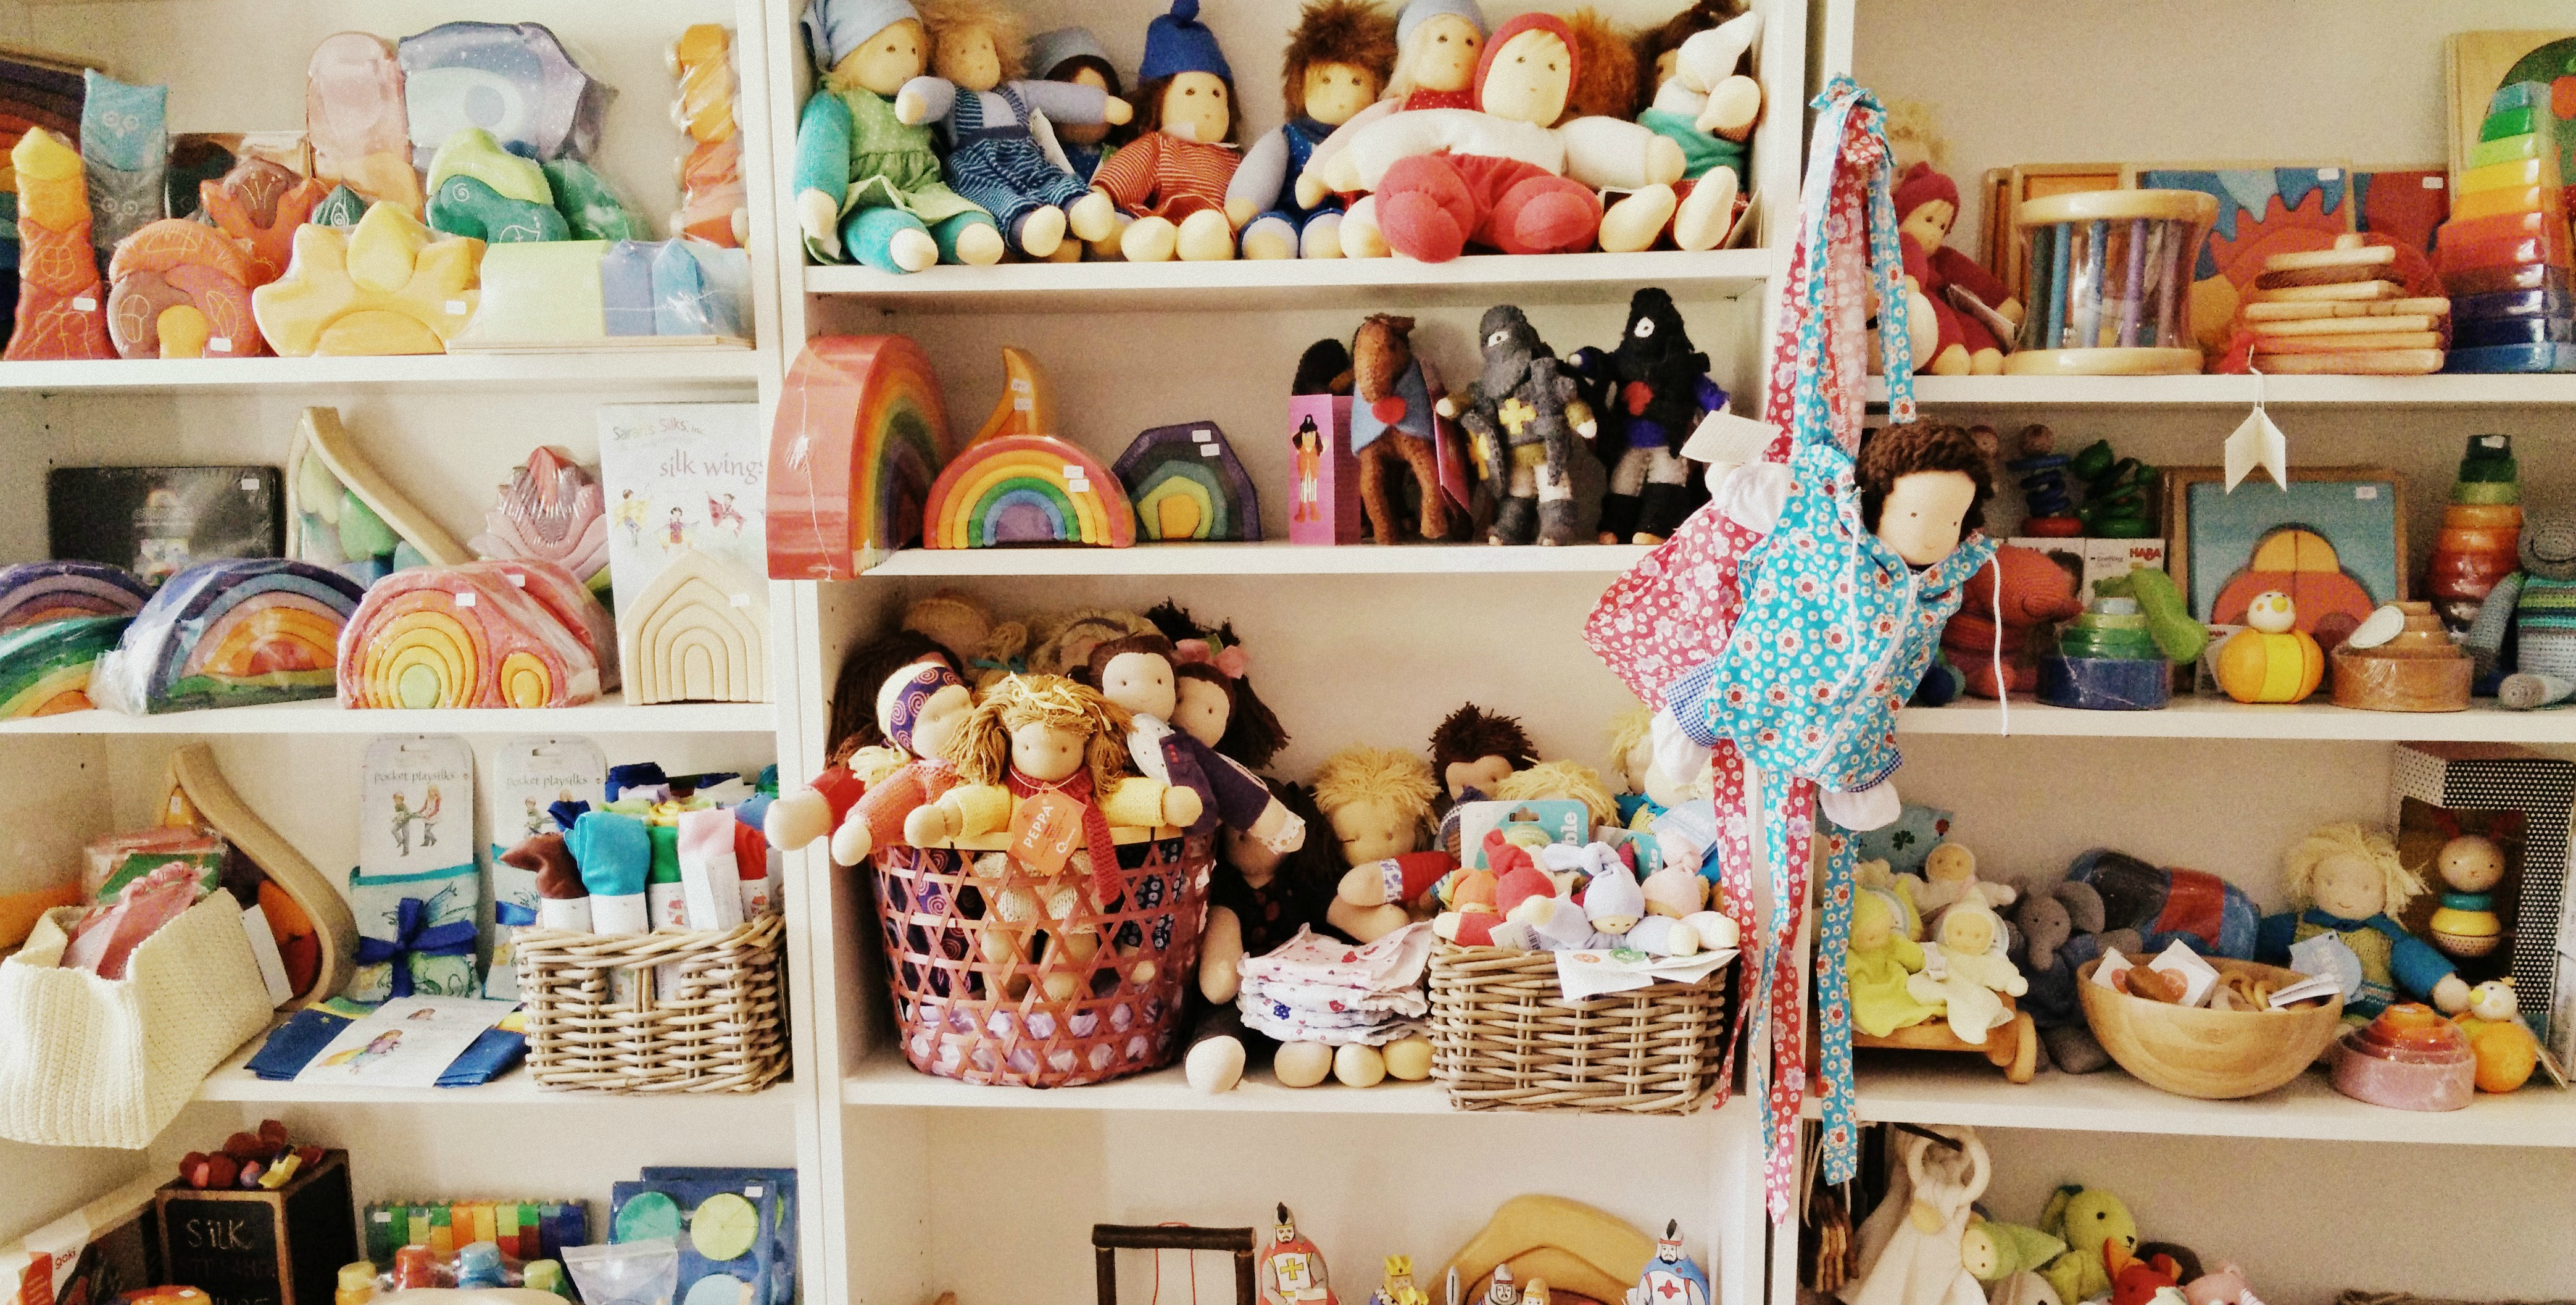 toy-shelf1.jpg